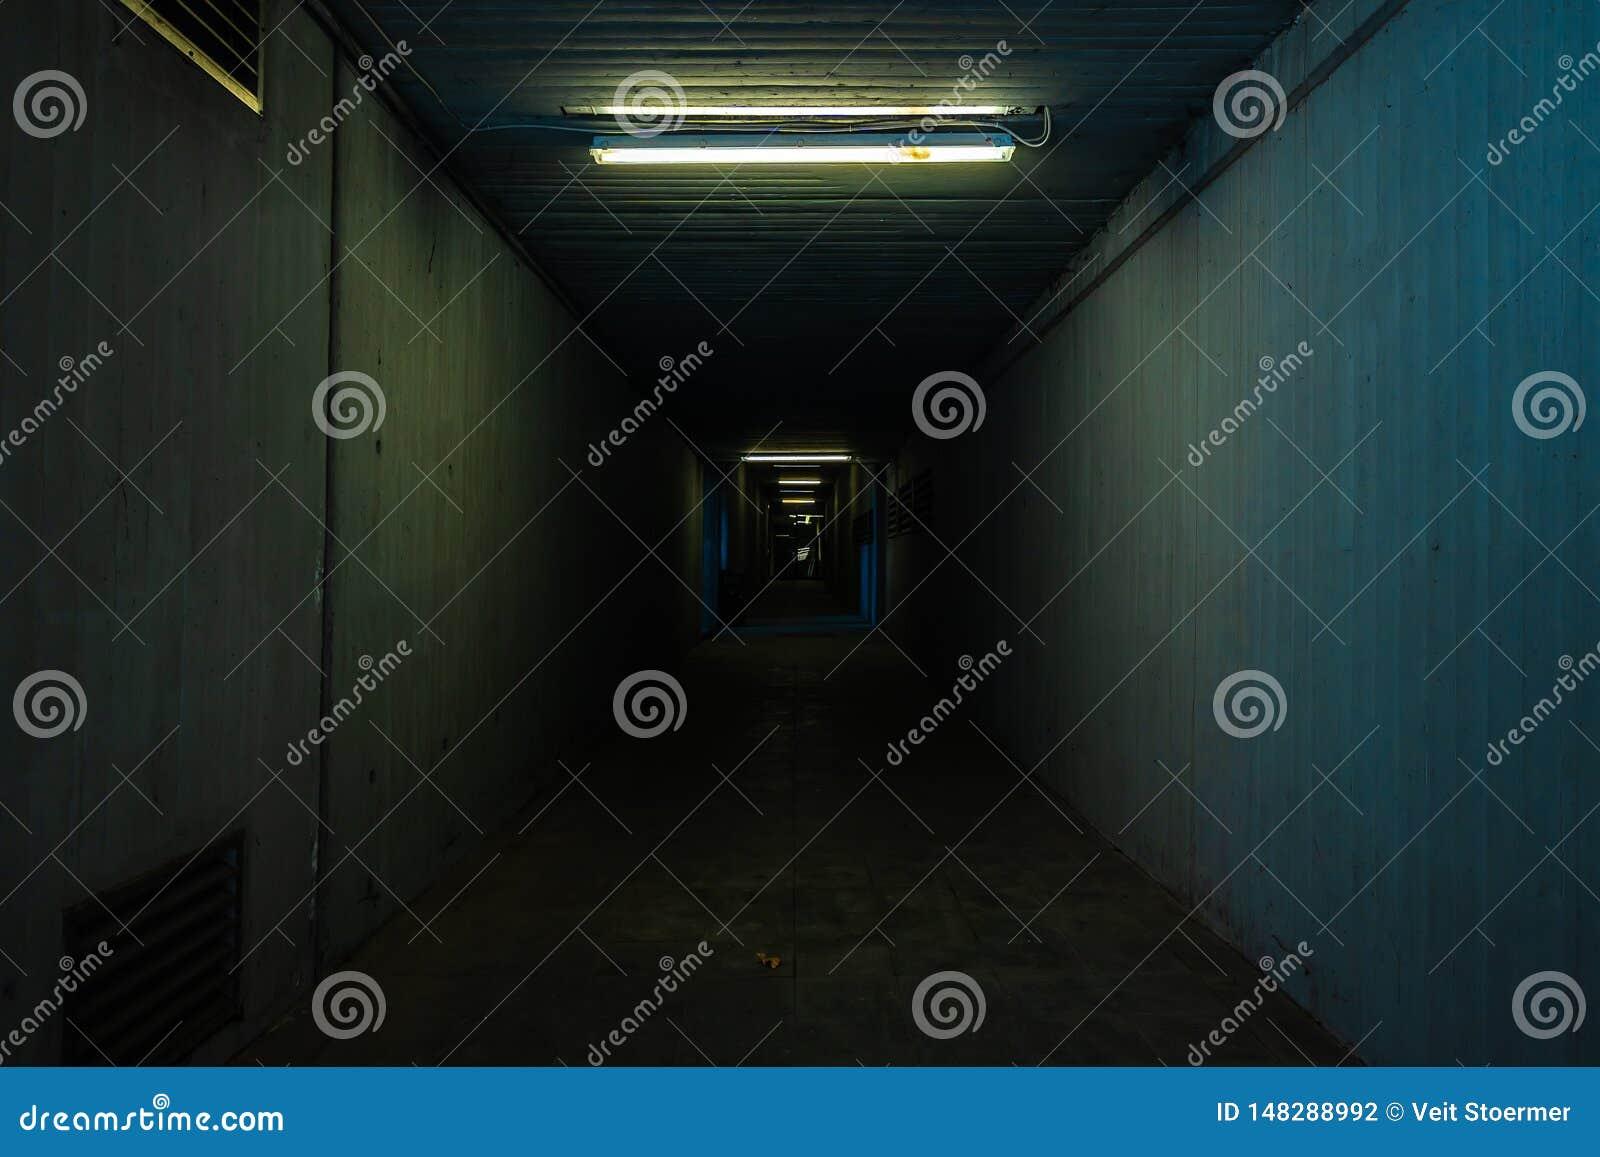 Small and dark tunnel